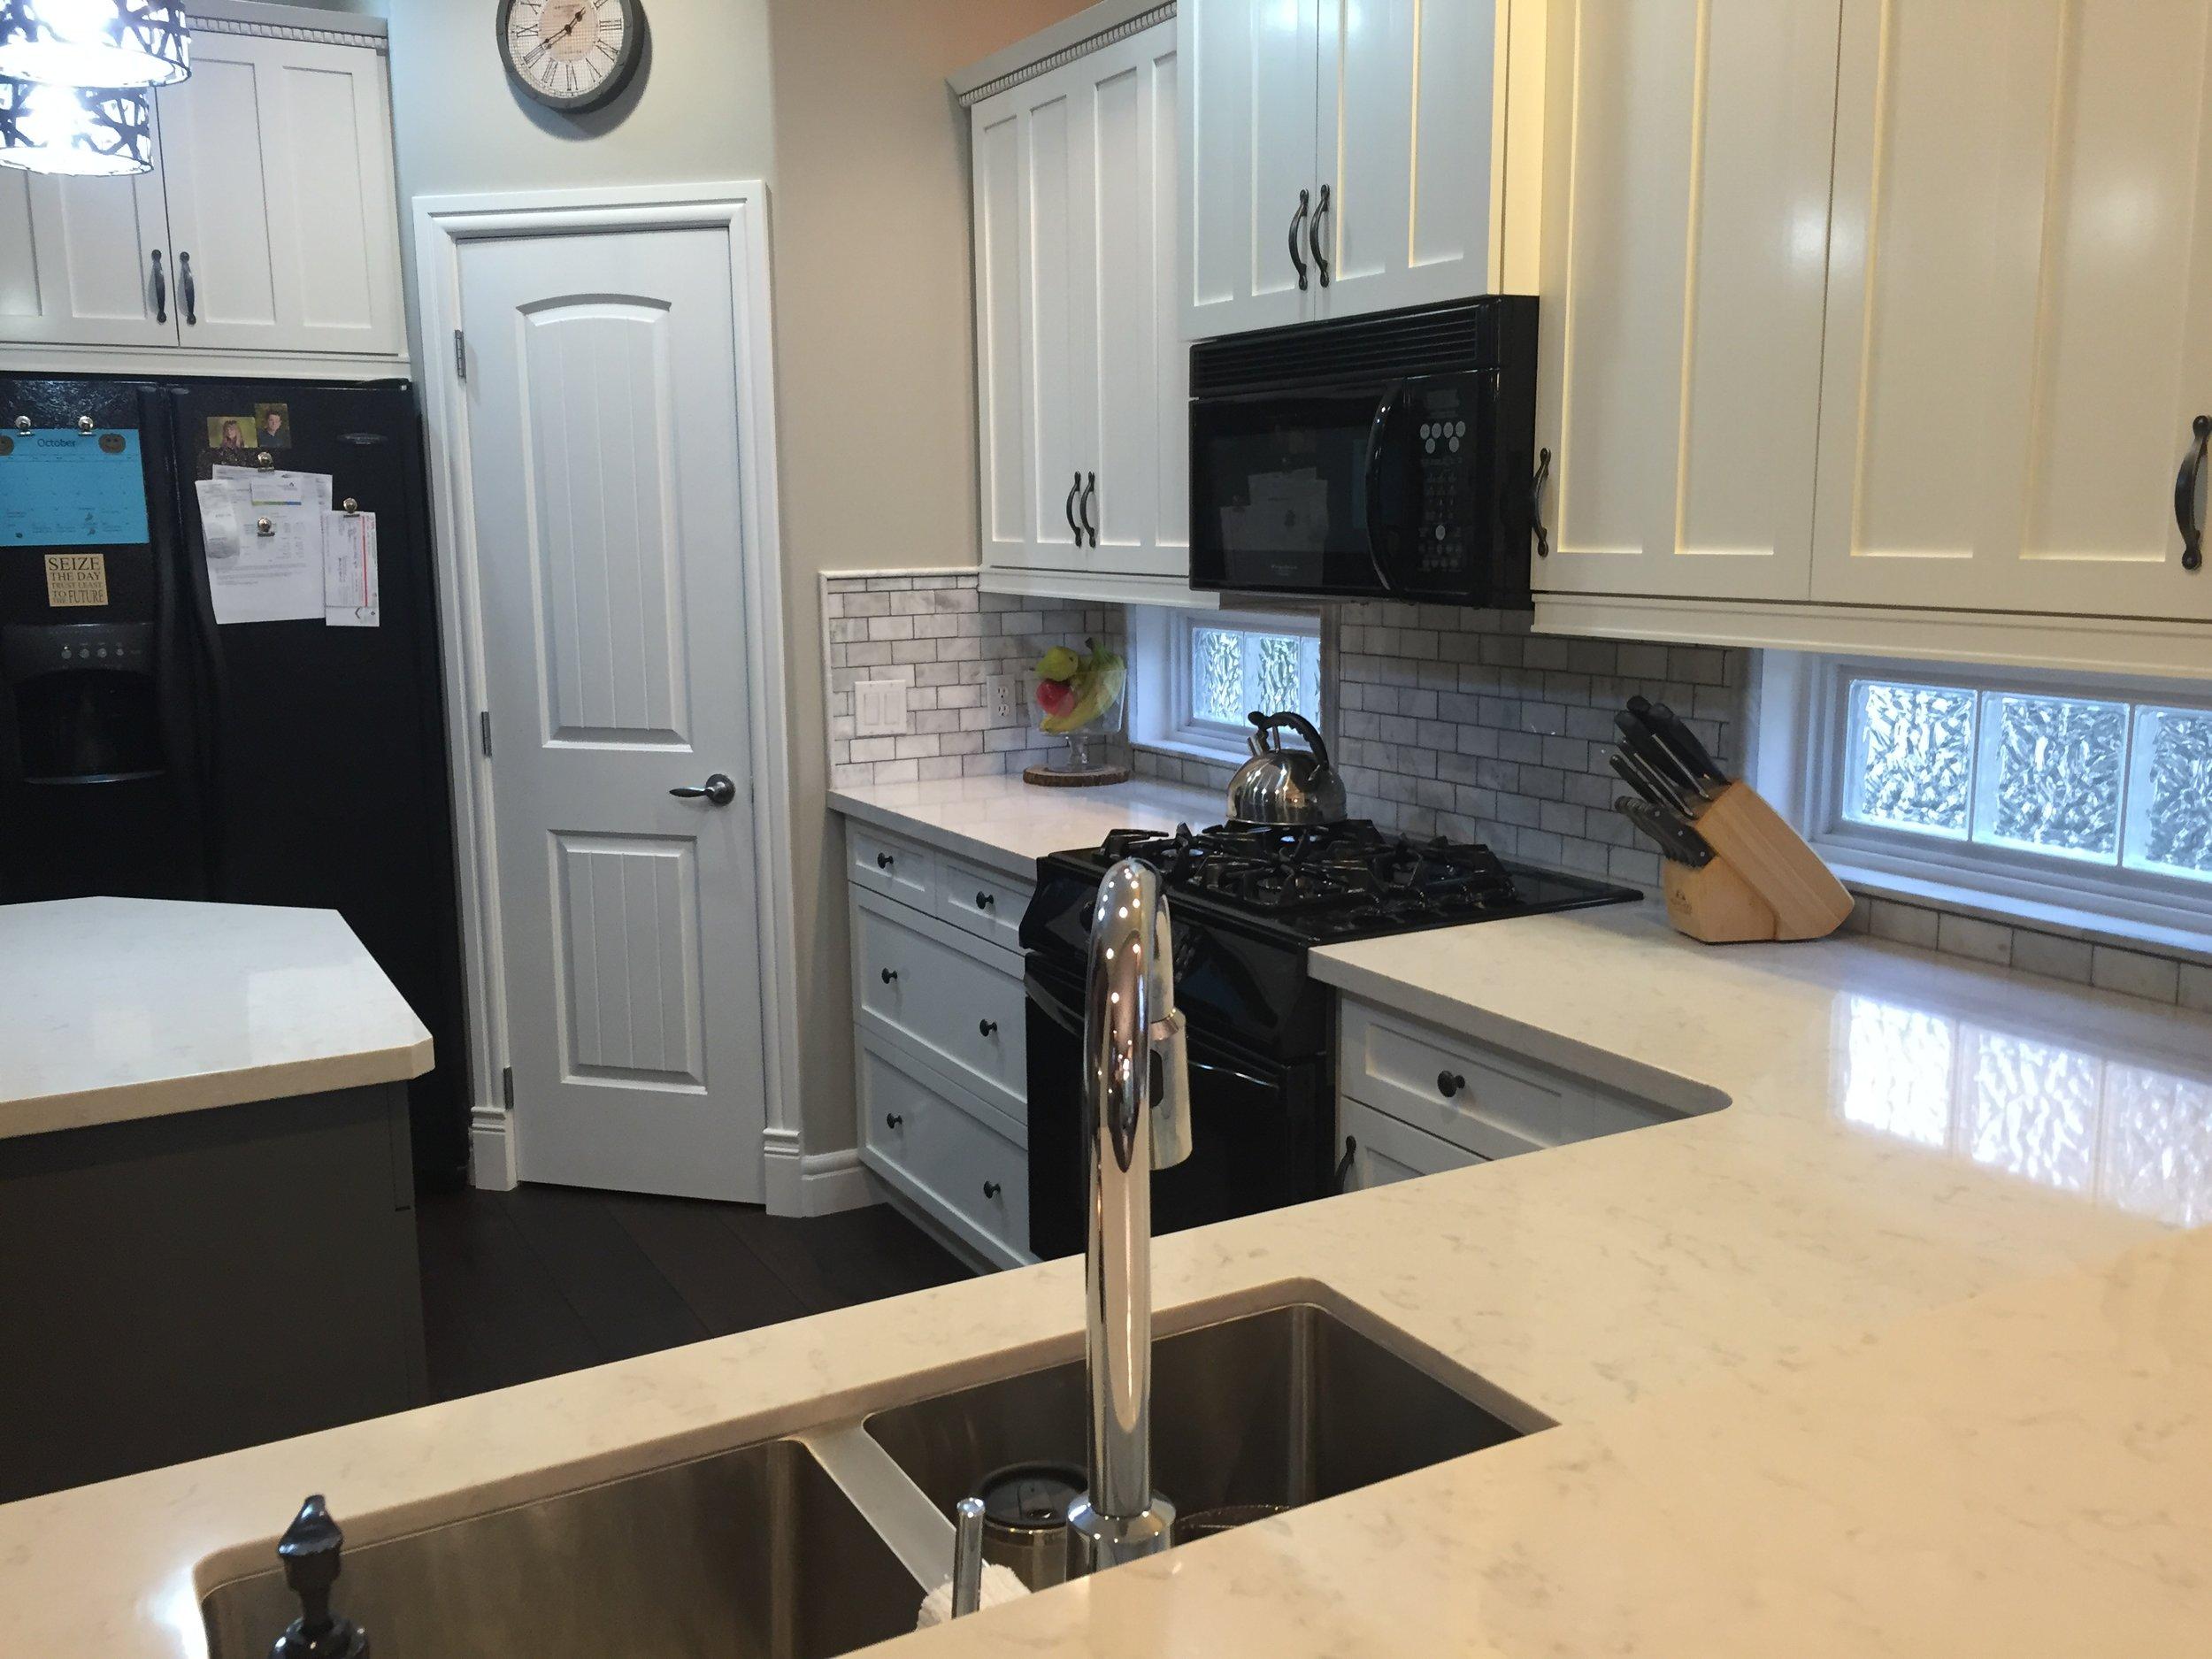 White Quartz countertop, marble backsplash, painted cabinets